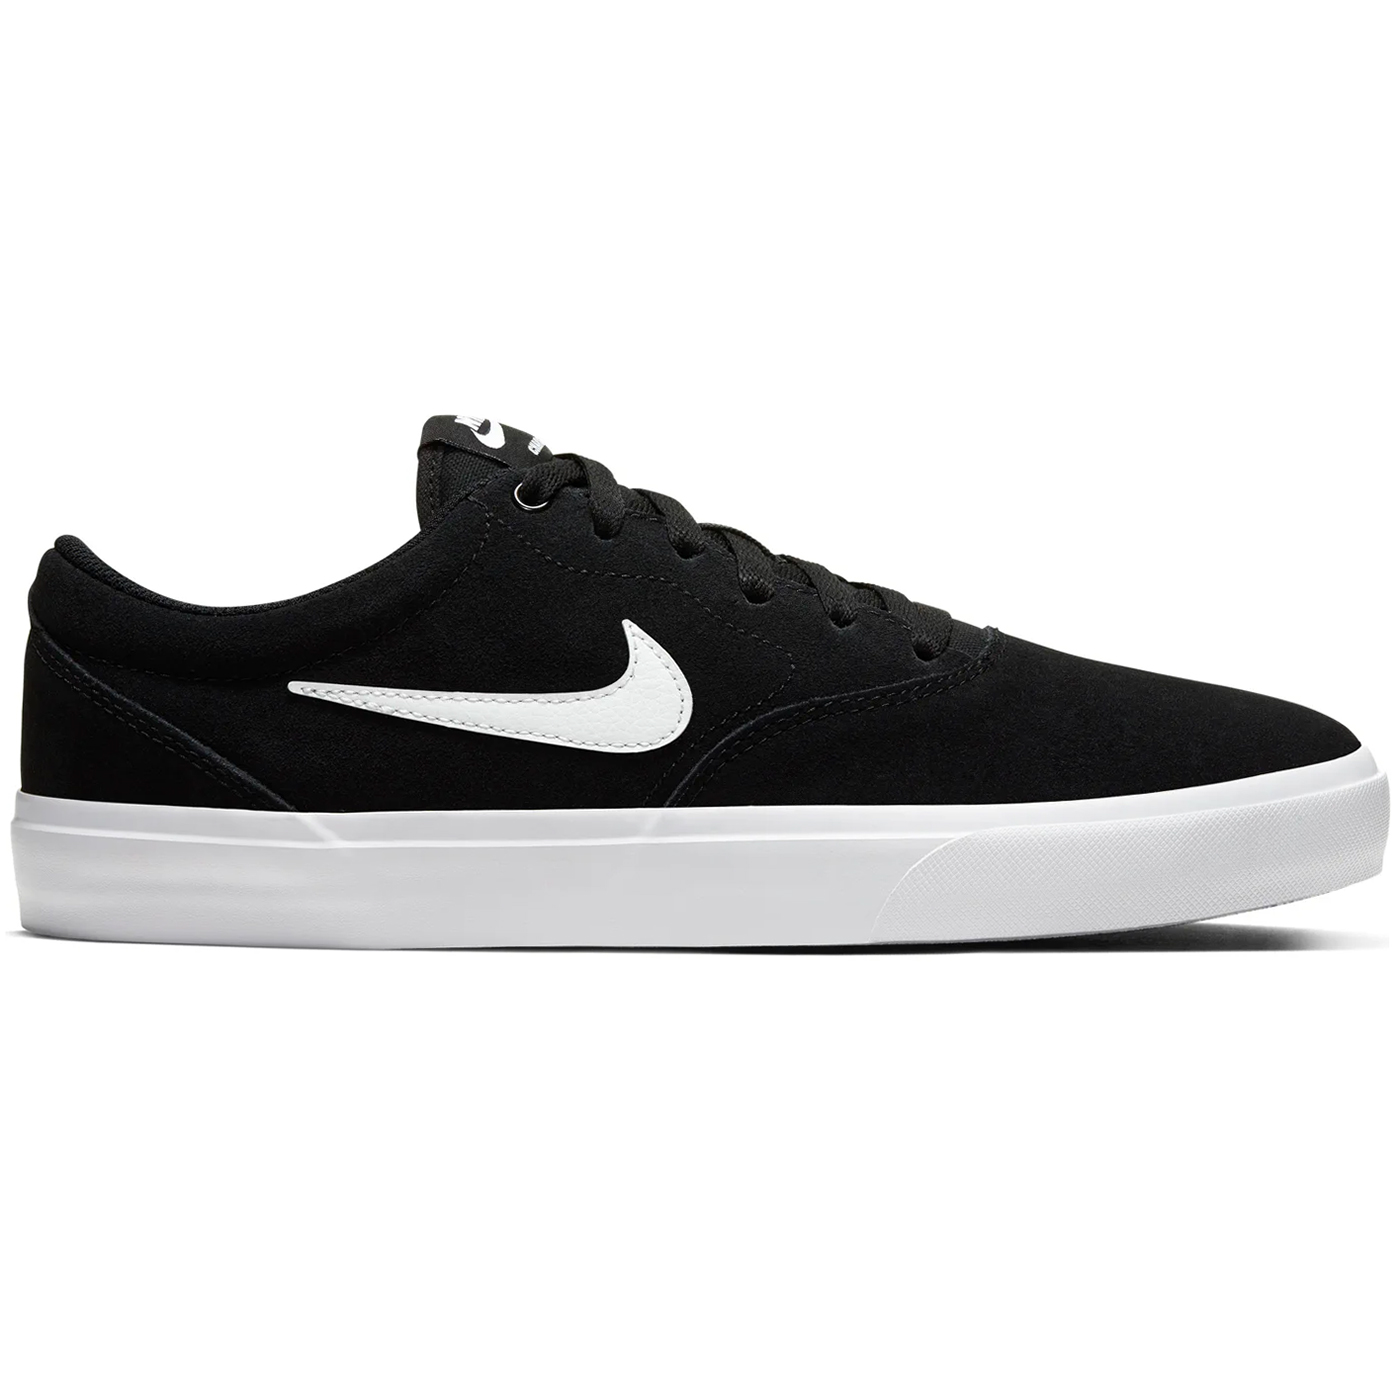 Nike SB Charge Suede Sneaker Skateschuh schwarz weiß CT3463 003